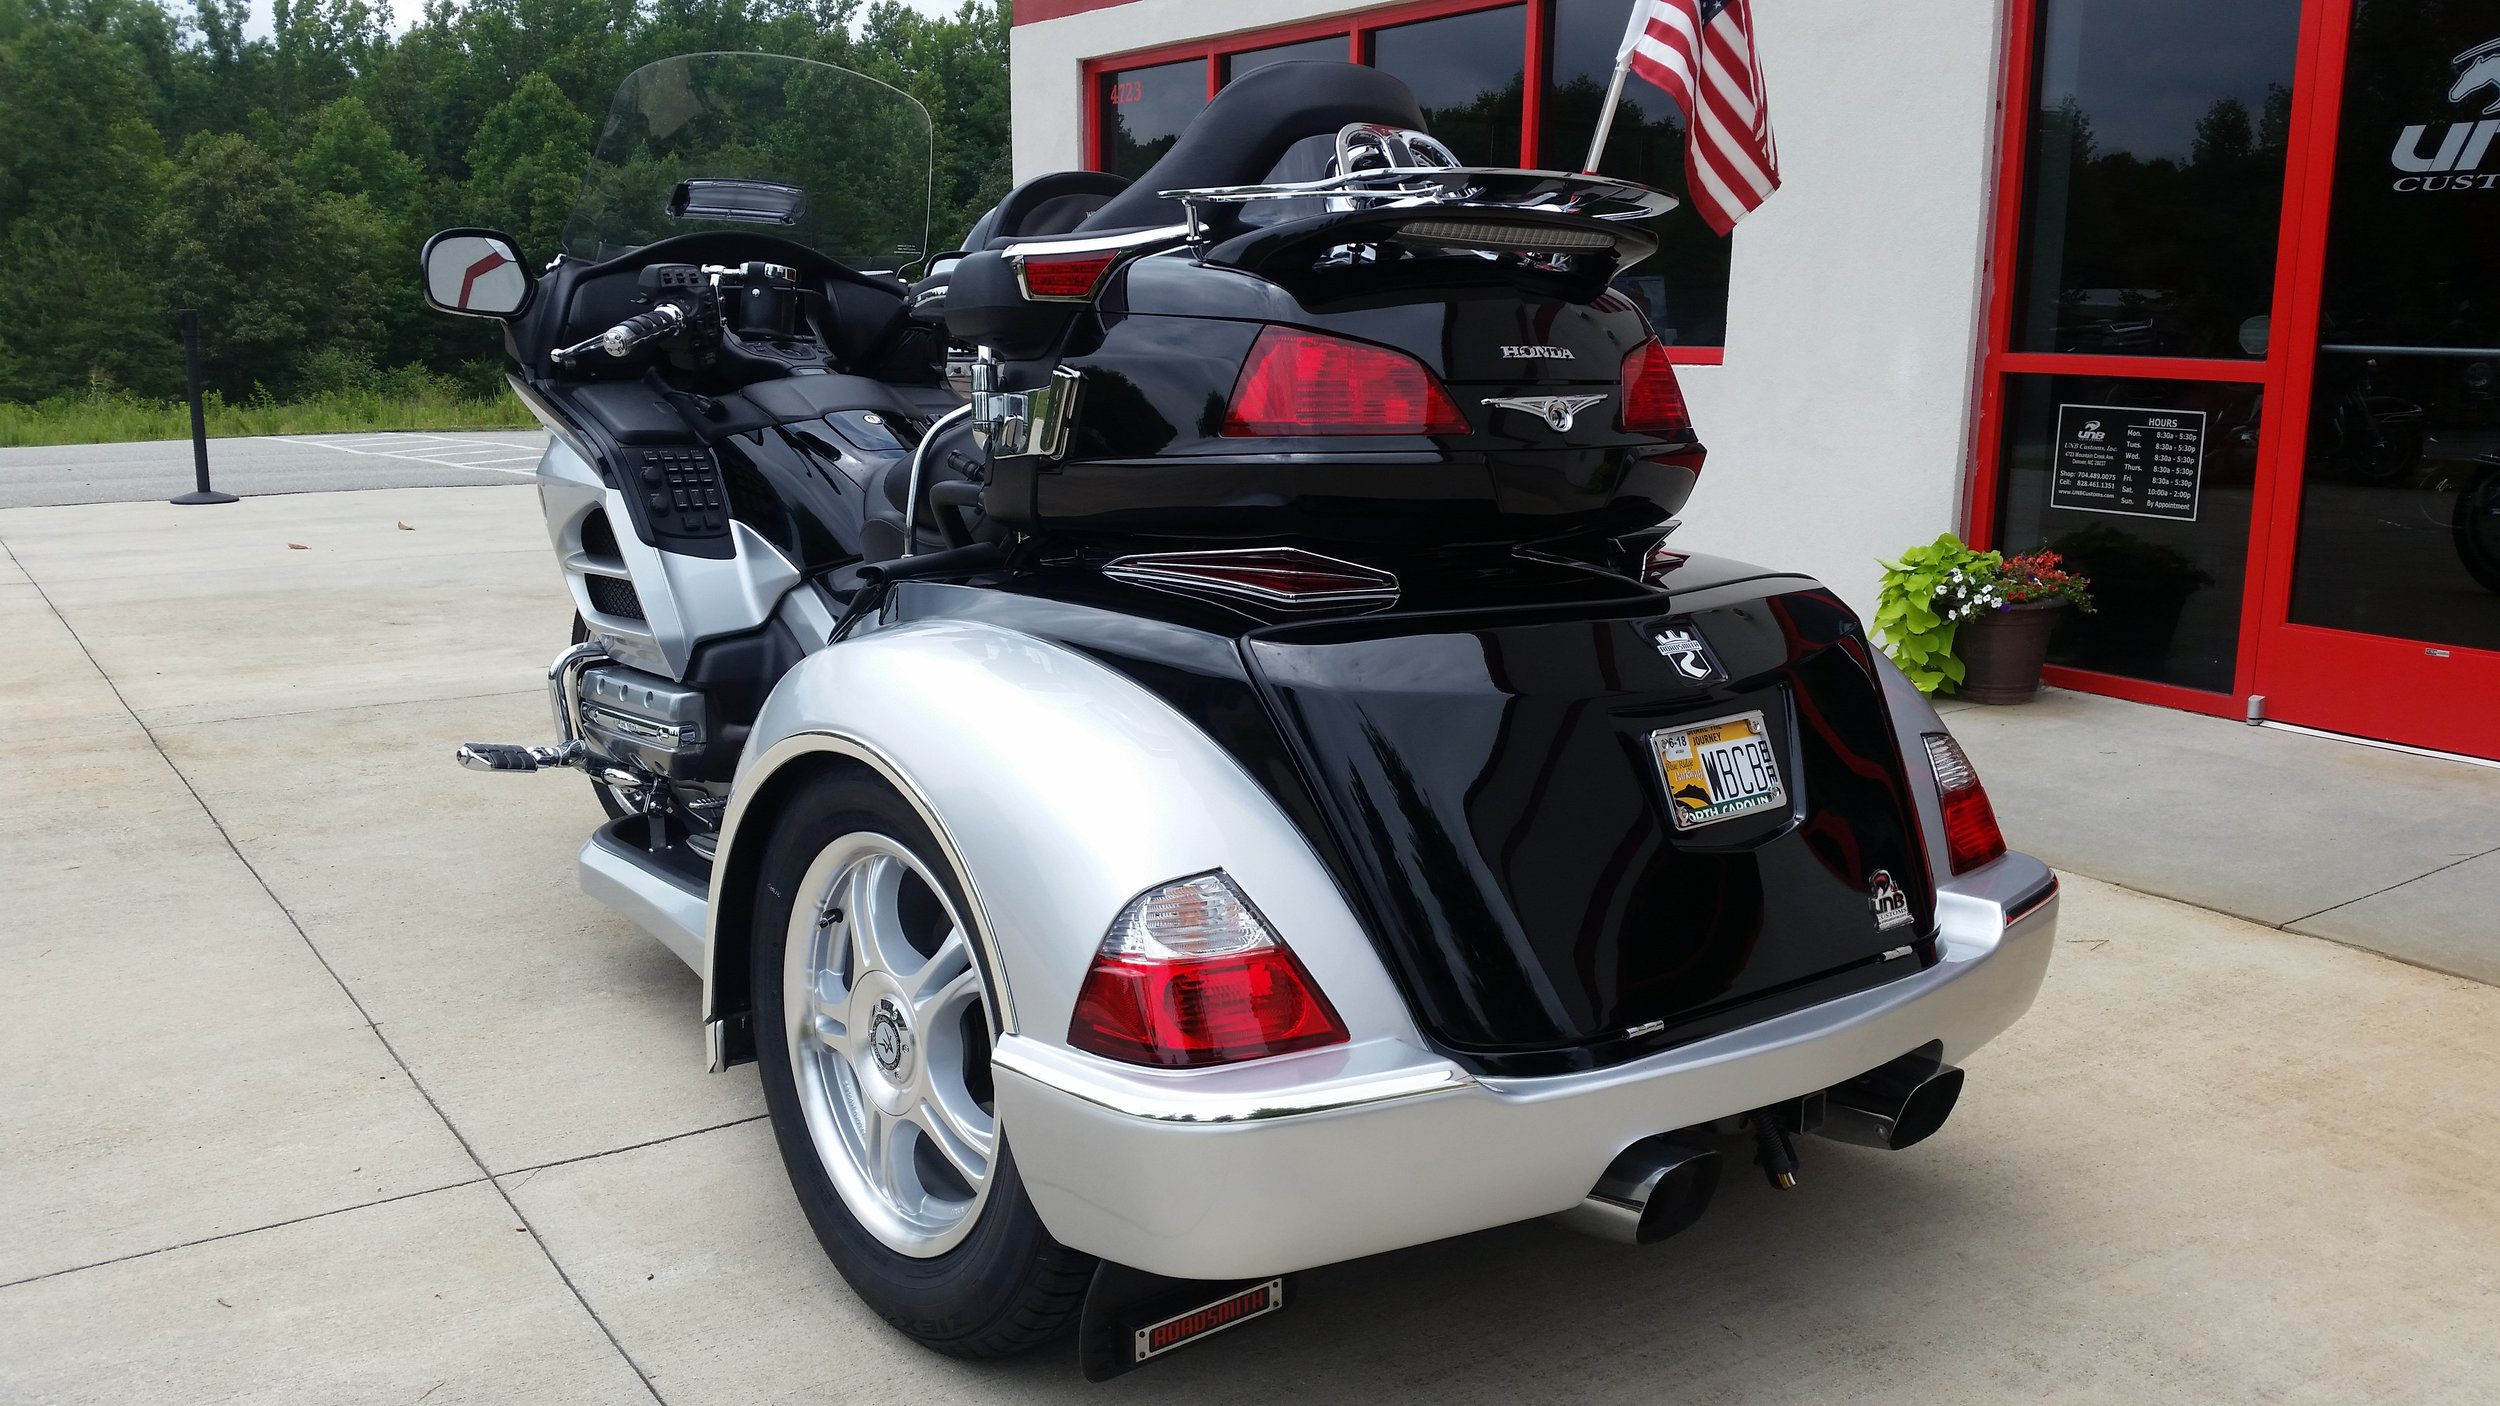 2012 Honda GL1800 Roadsmith trike black and silver rear